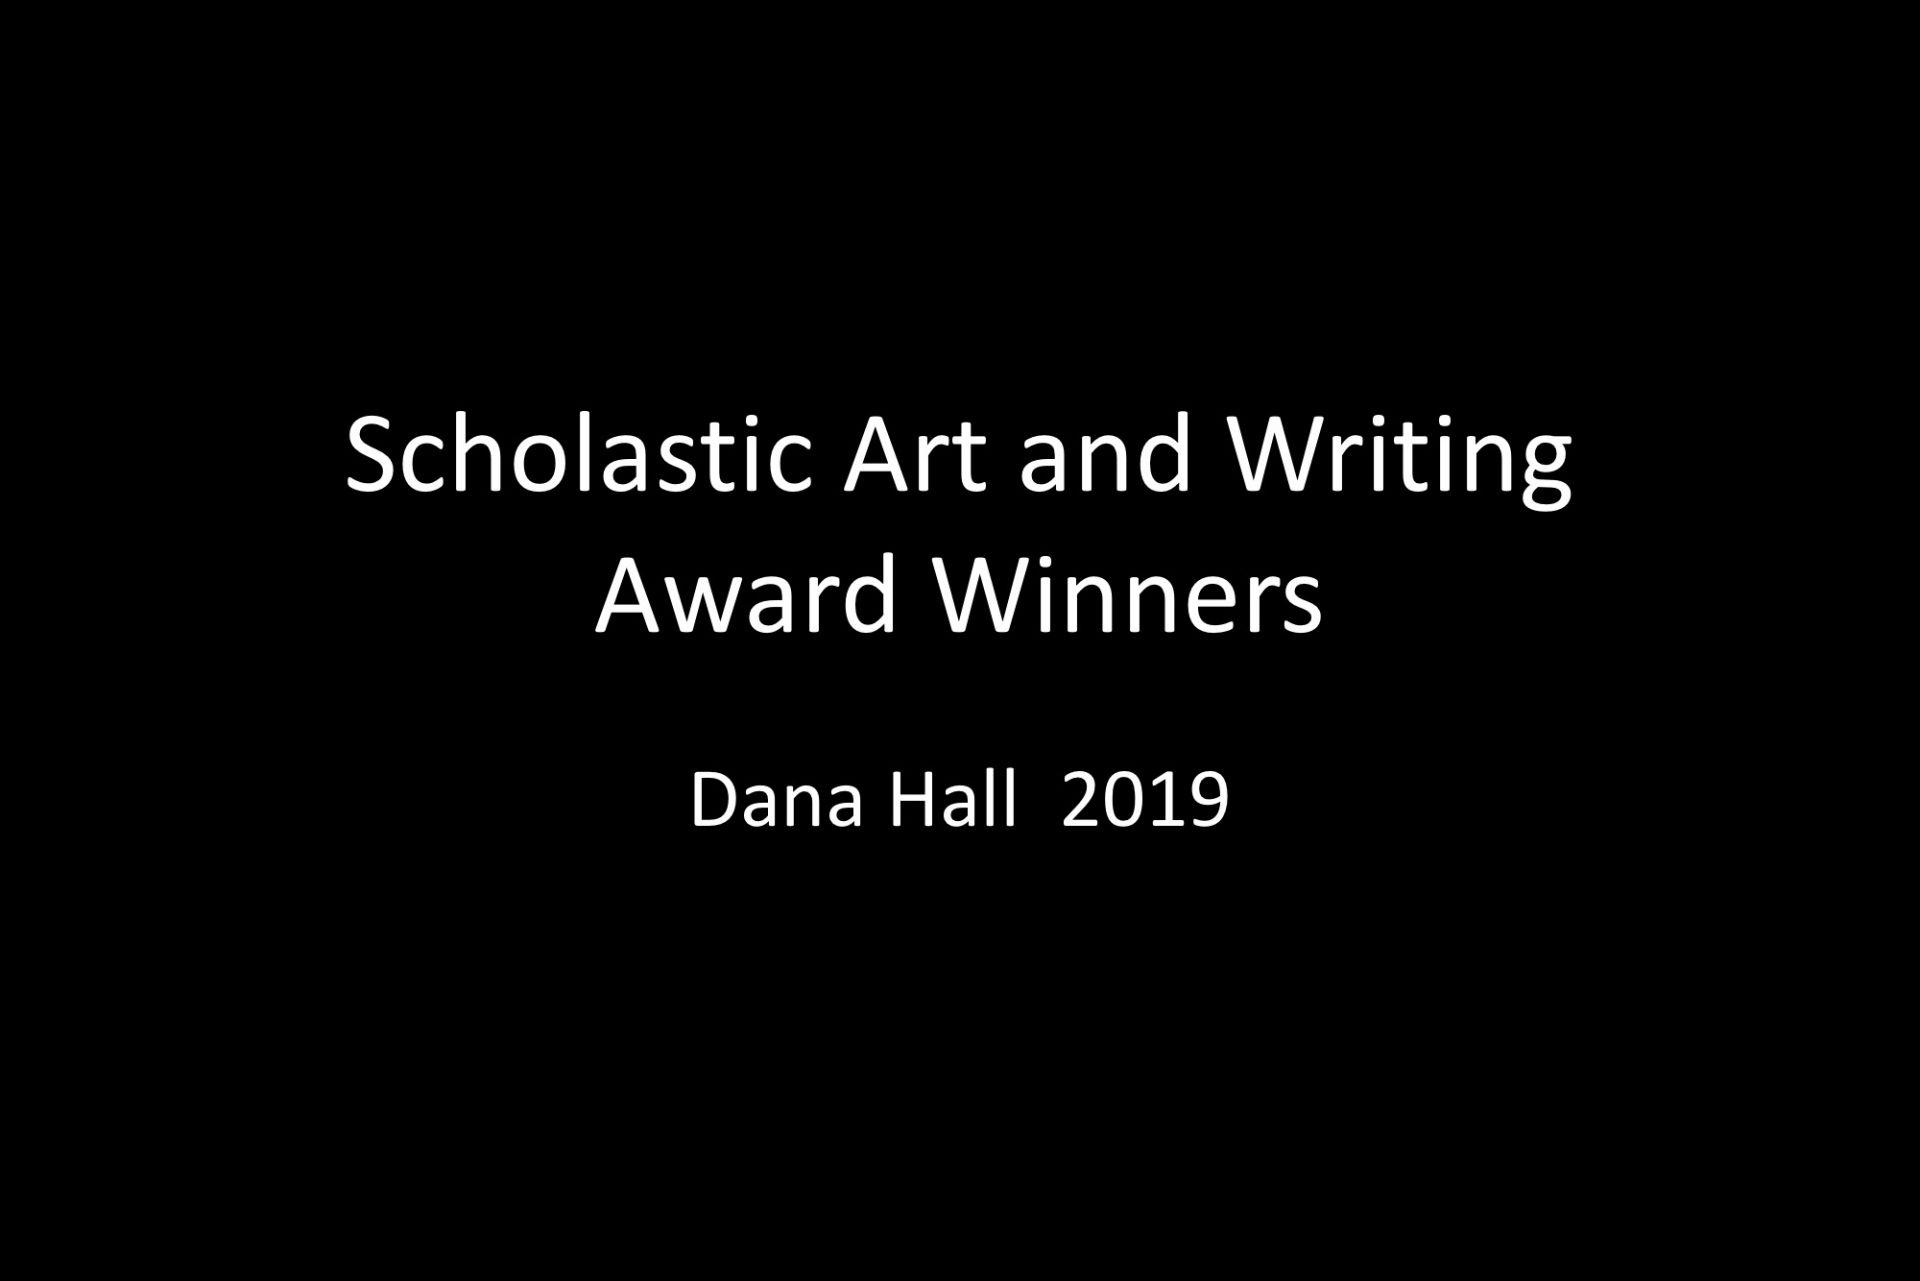 Dana Hall | The Dana Hall Art Gallery